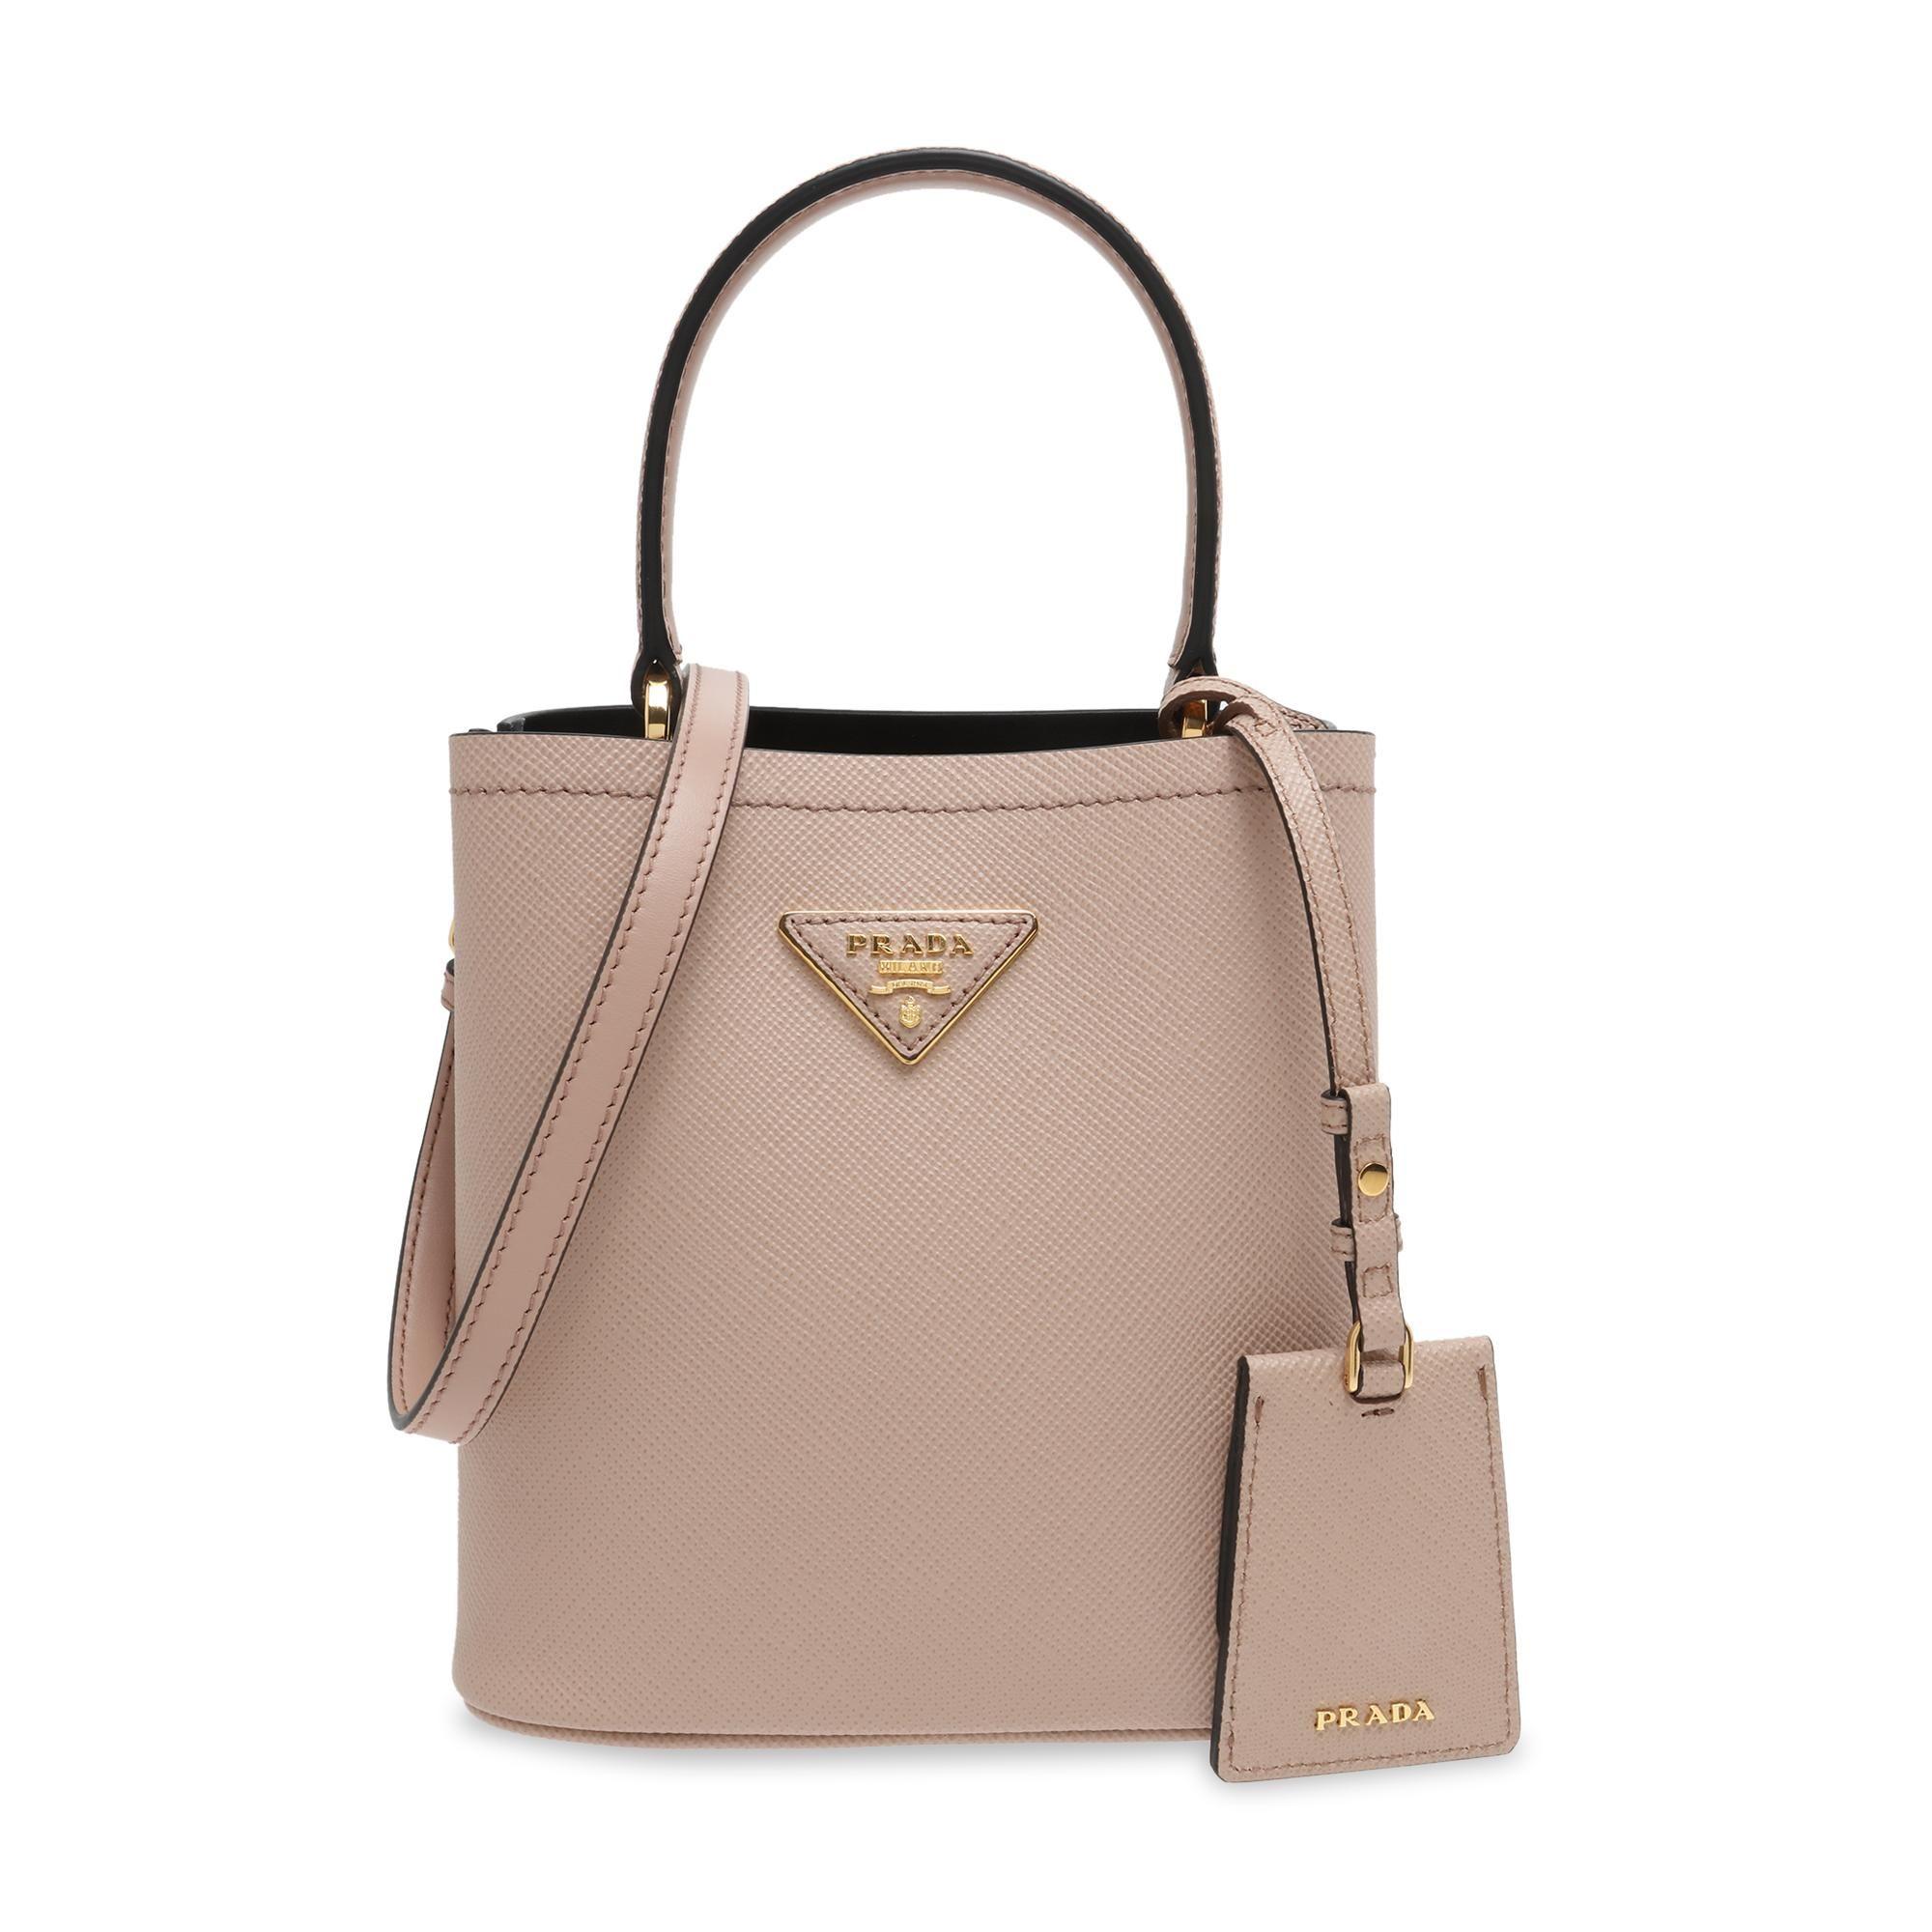 Panier leather bag